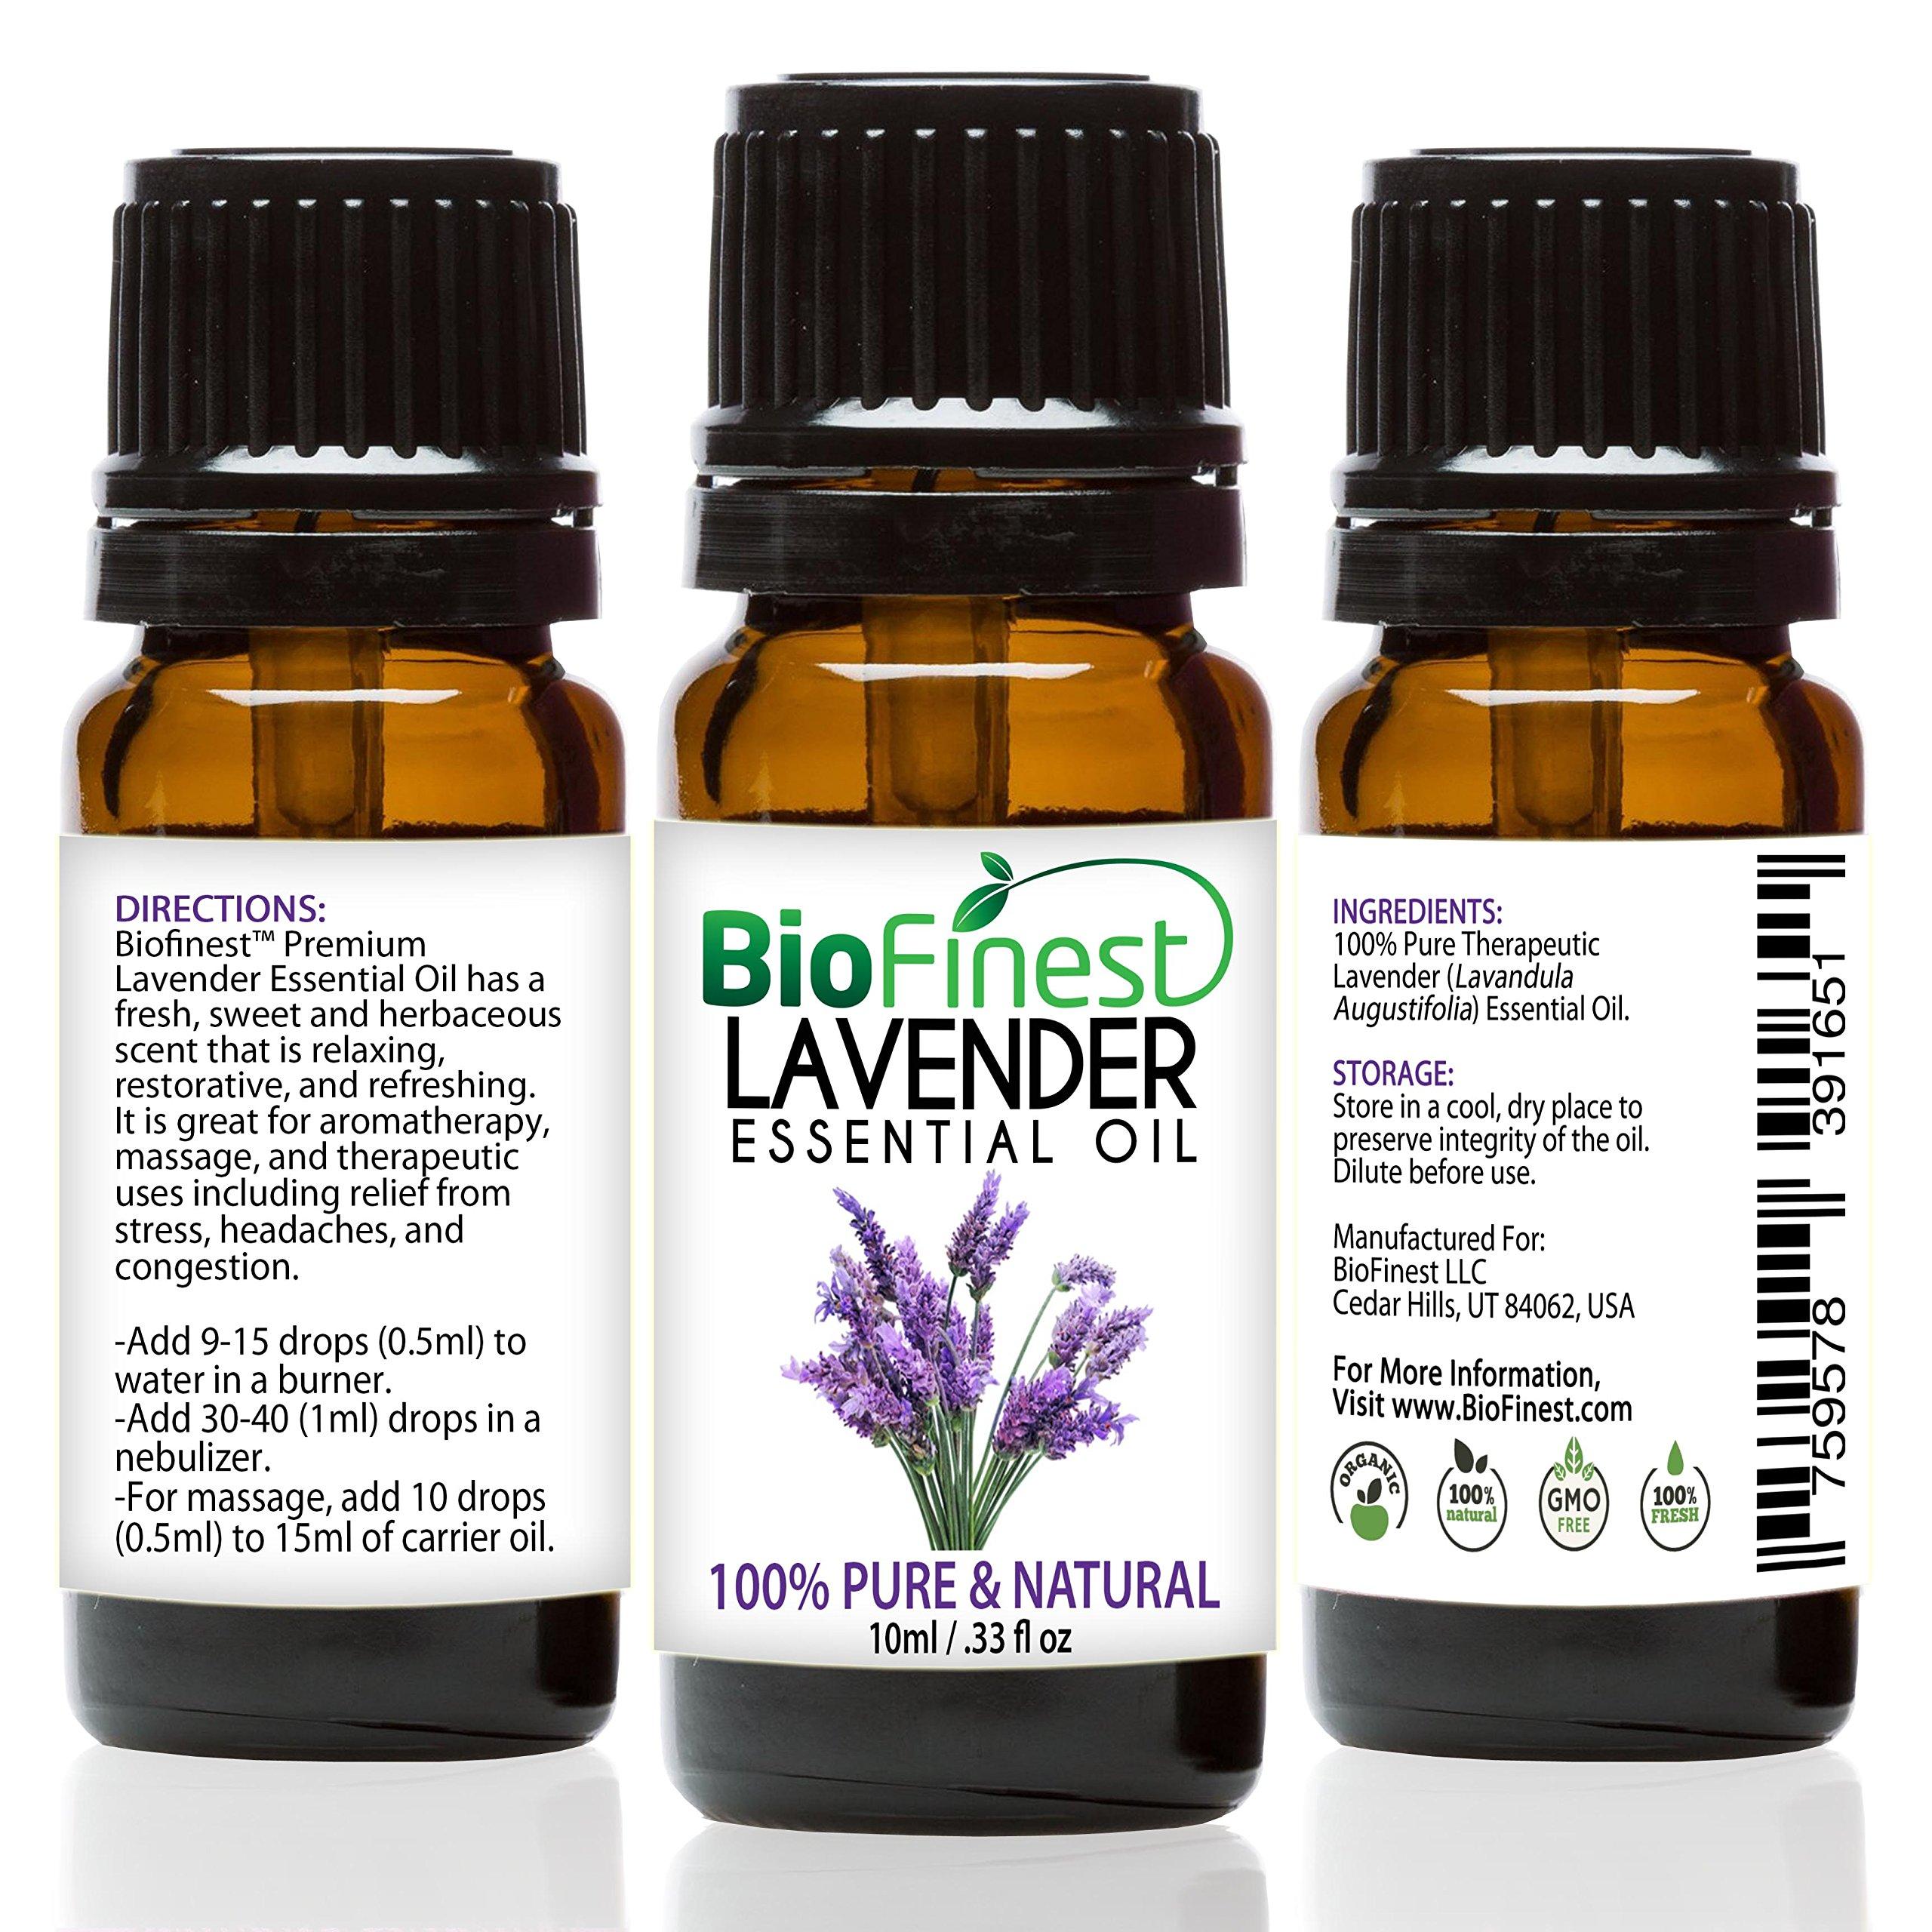 BioFinest Lavender Oil - 100% Pure Lavender Essential Oil - Therapeutic Grade - Bulgaria Premium Quality - Best For Aromatherapy, Diffuser, Massage, Anxiety & Stress Relief - FREE E-Book (10ml)